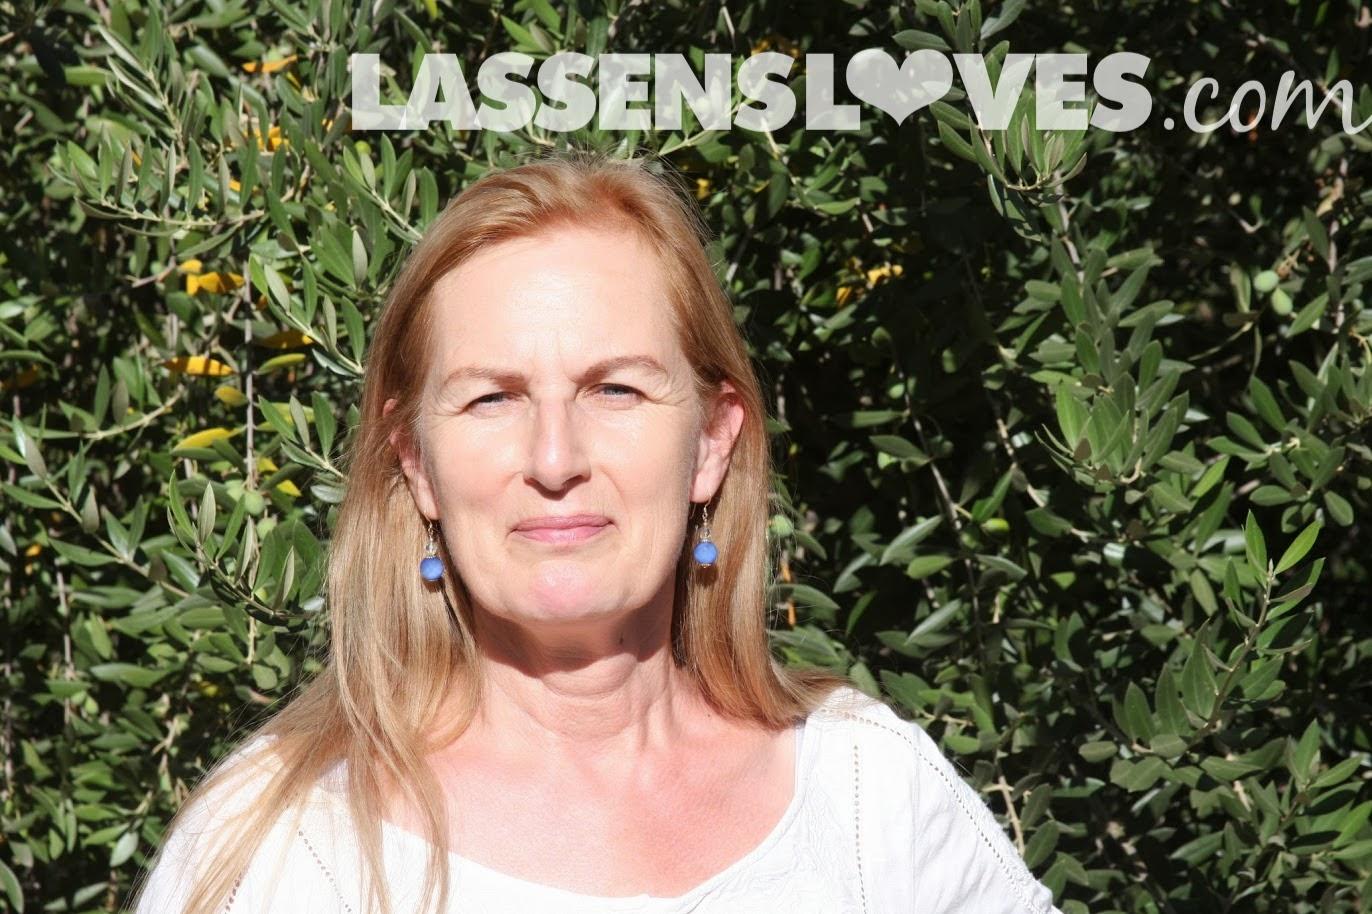 lassensloves.com, Lassen's, Lassens, Ojai+Olive+Oil, Olive+Oil